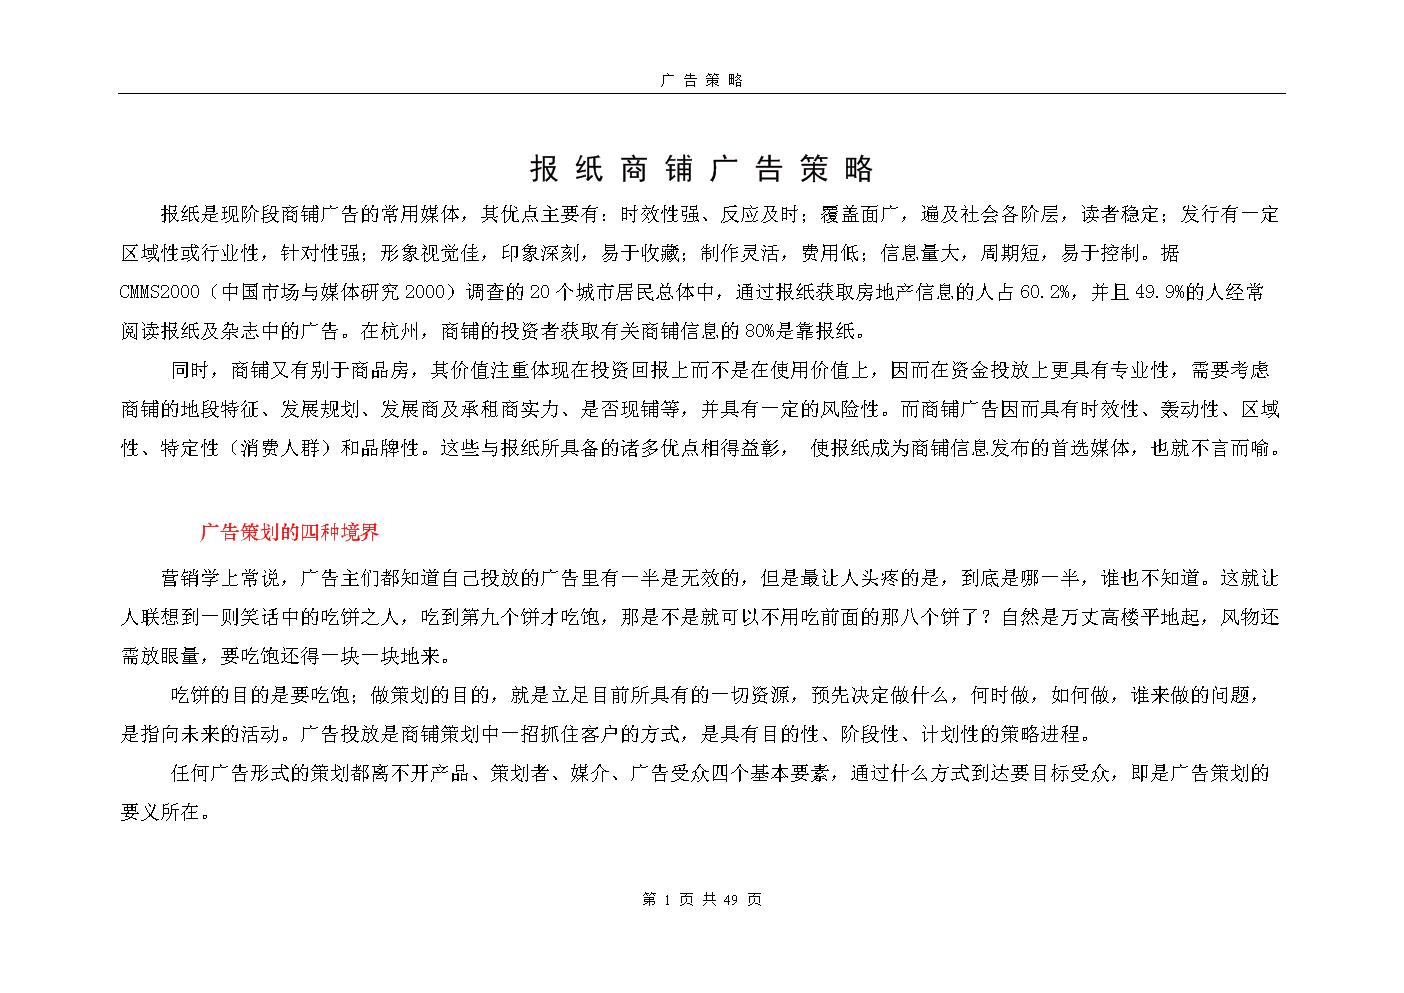 商铺广告策略.doc